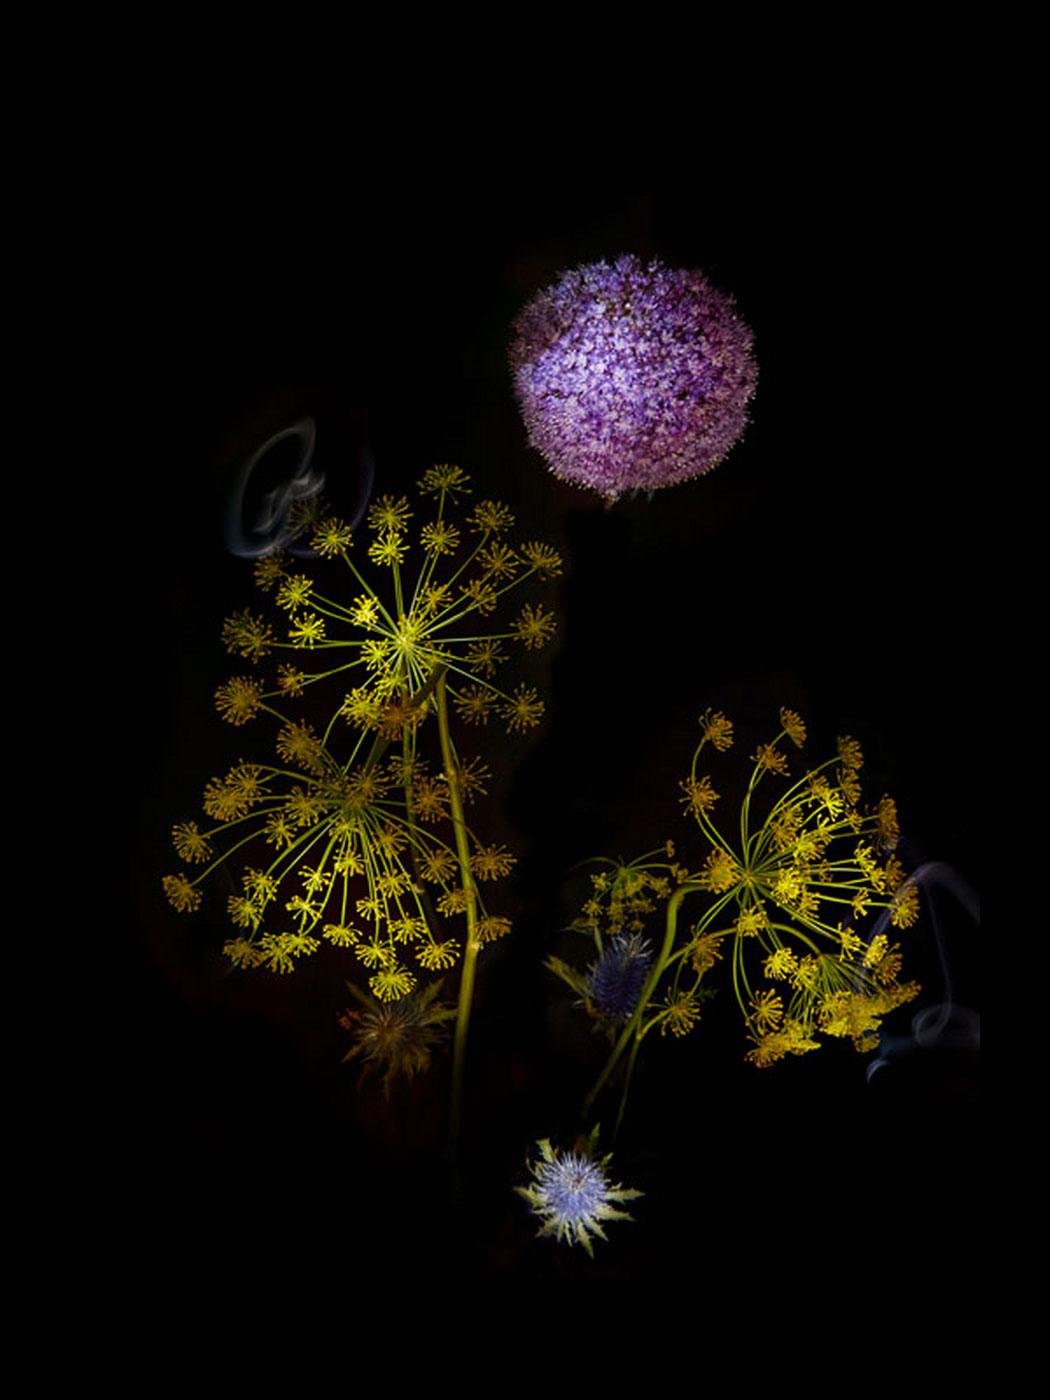 sarah-illenberger-flowerwork-06.jpg